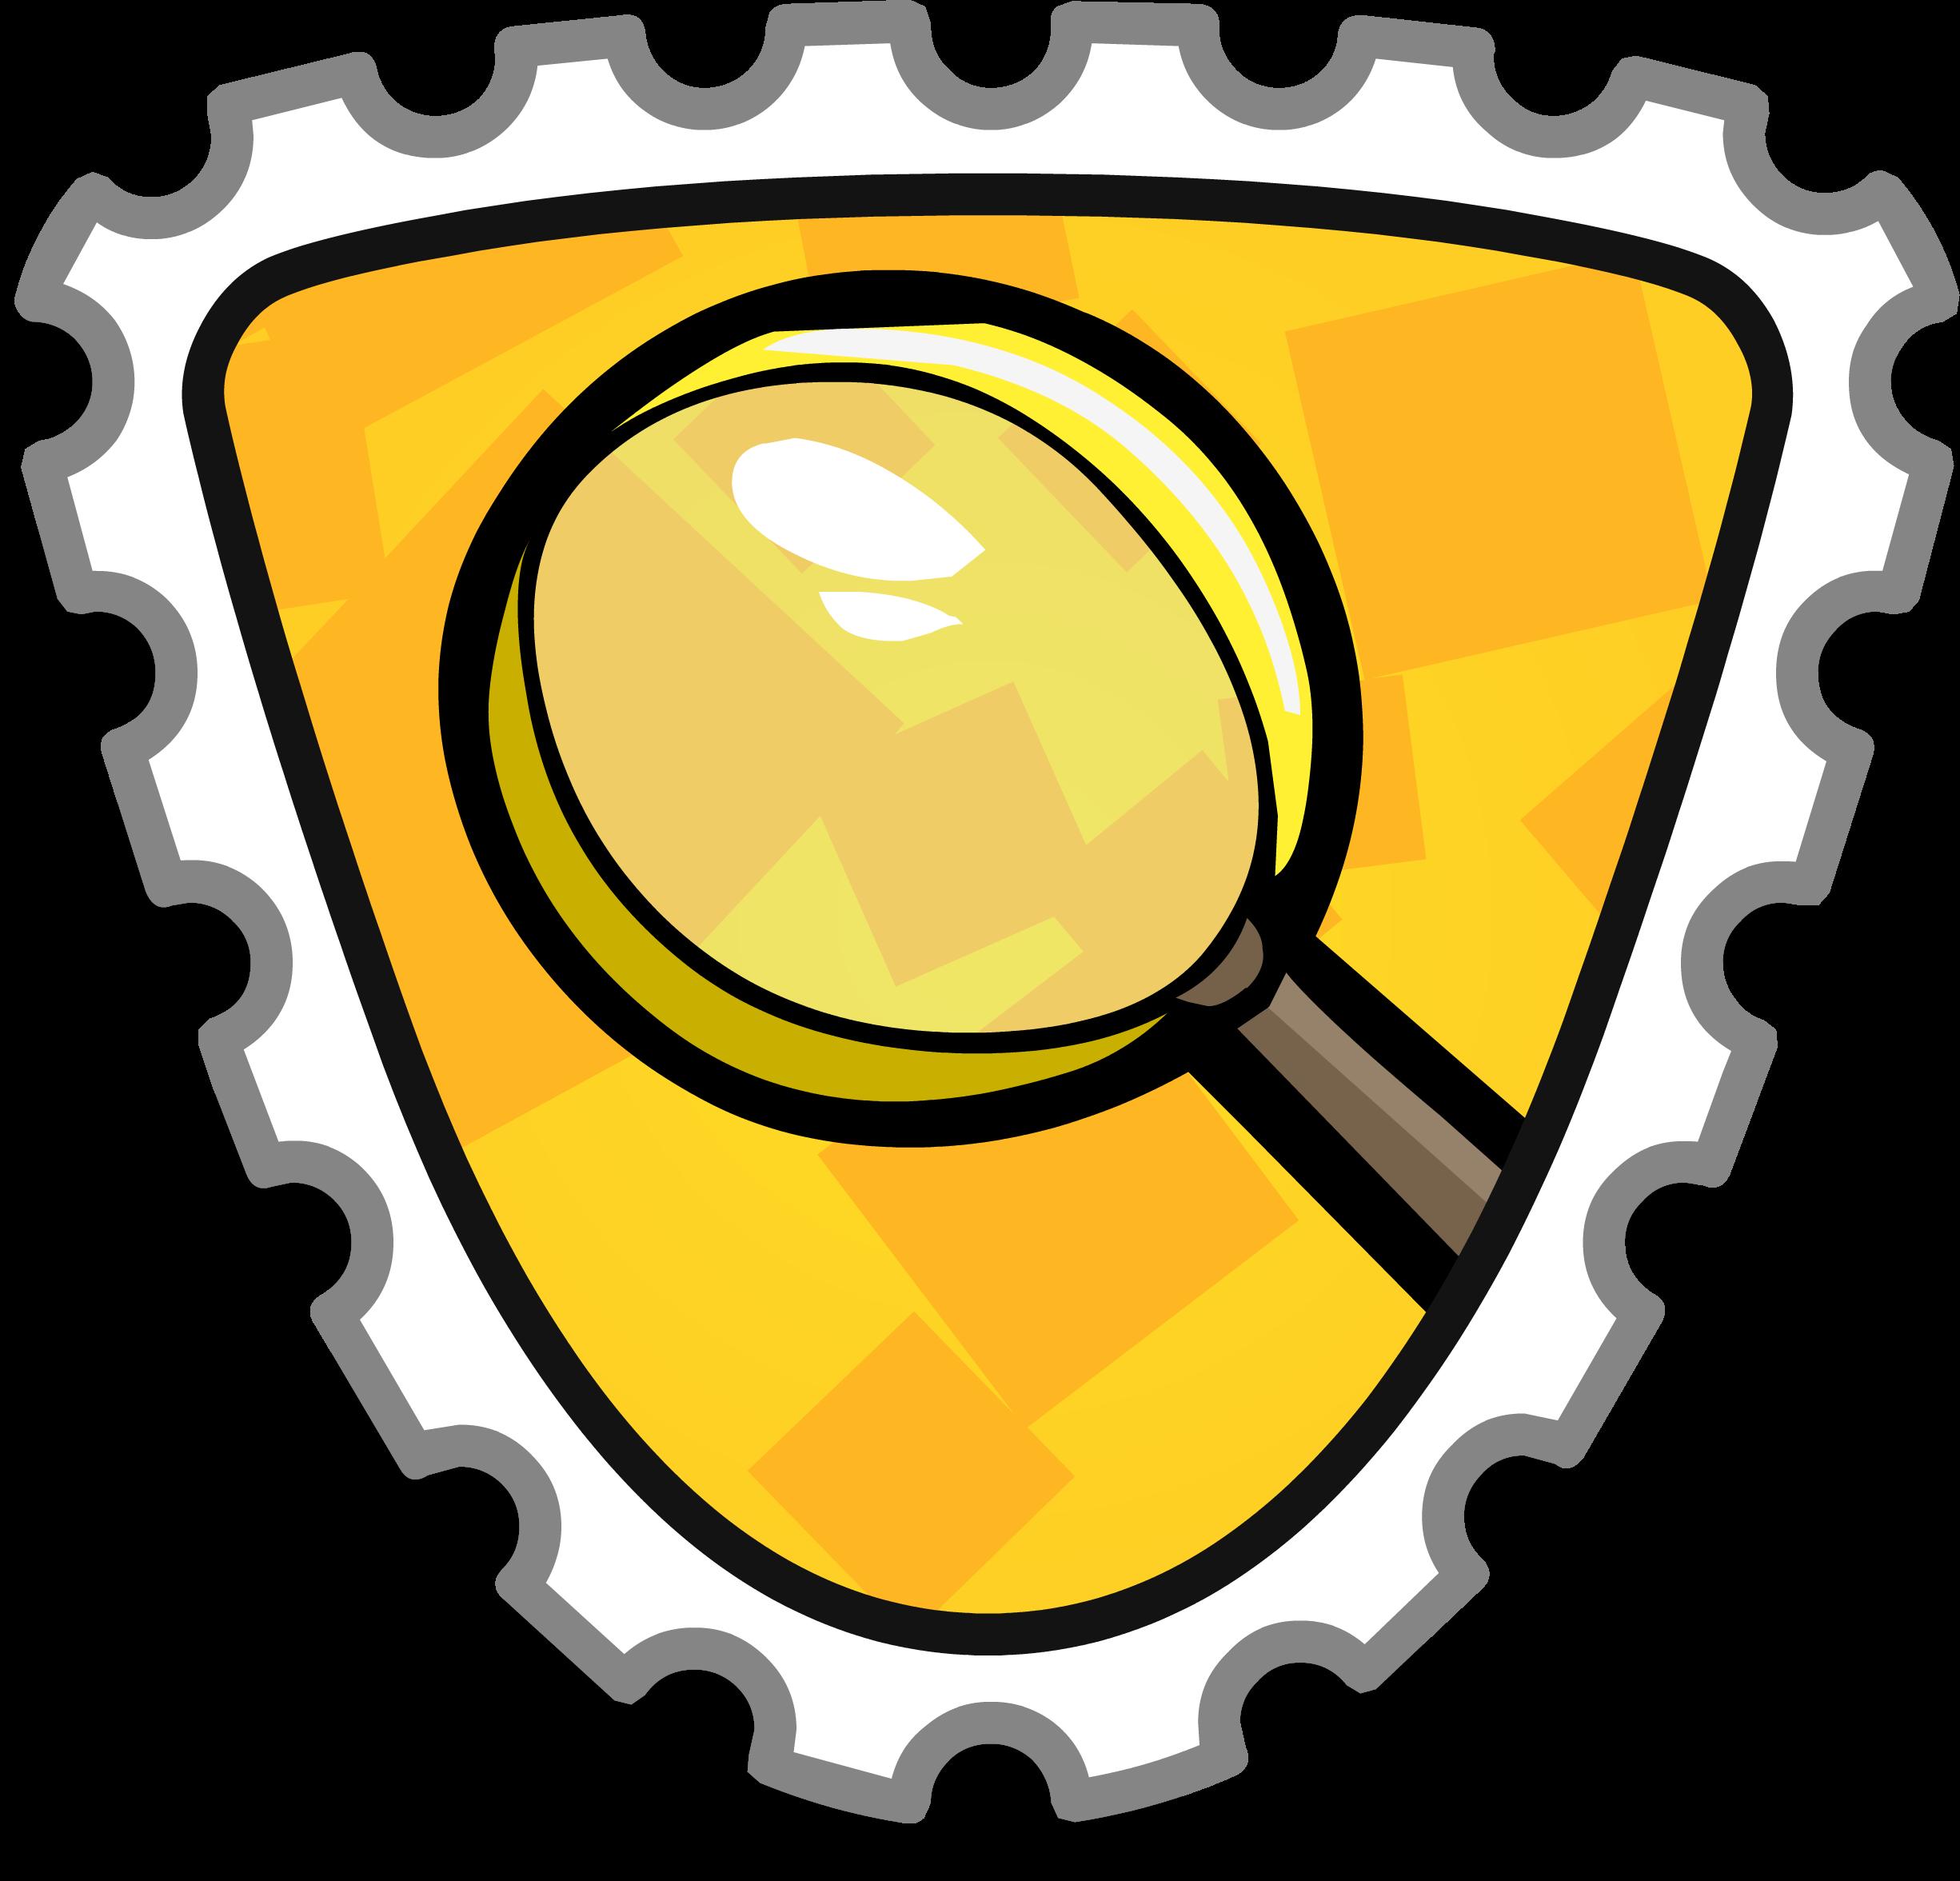 2451x2352 Scavenger Hunt Stamp Club Penguin Wiki Fandom Powered By Wikia